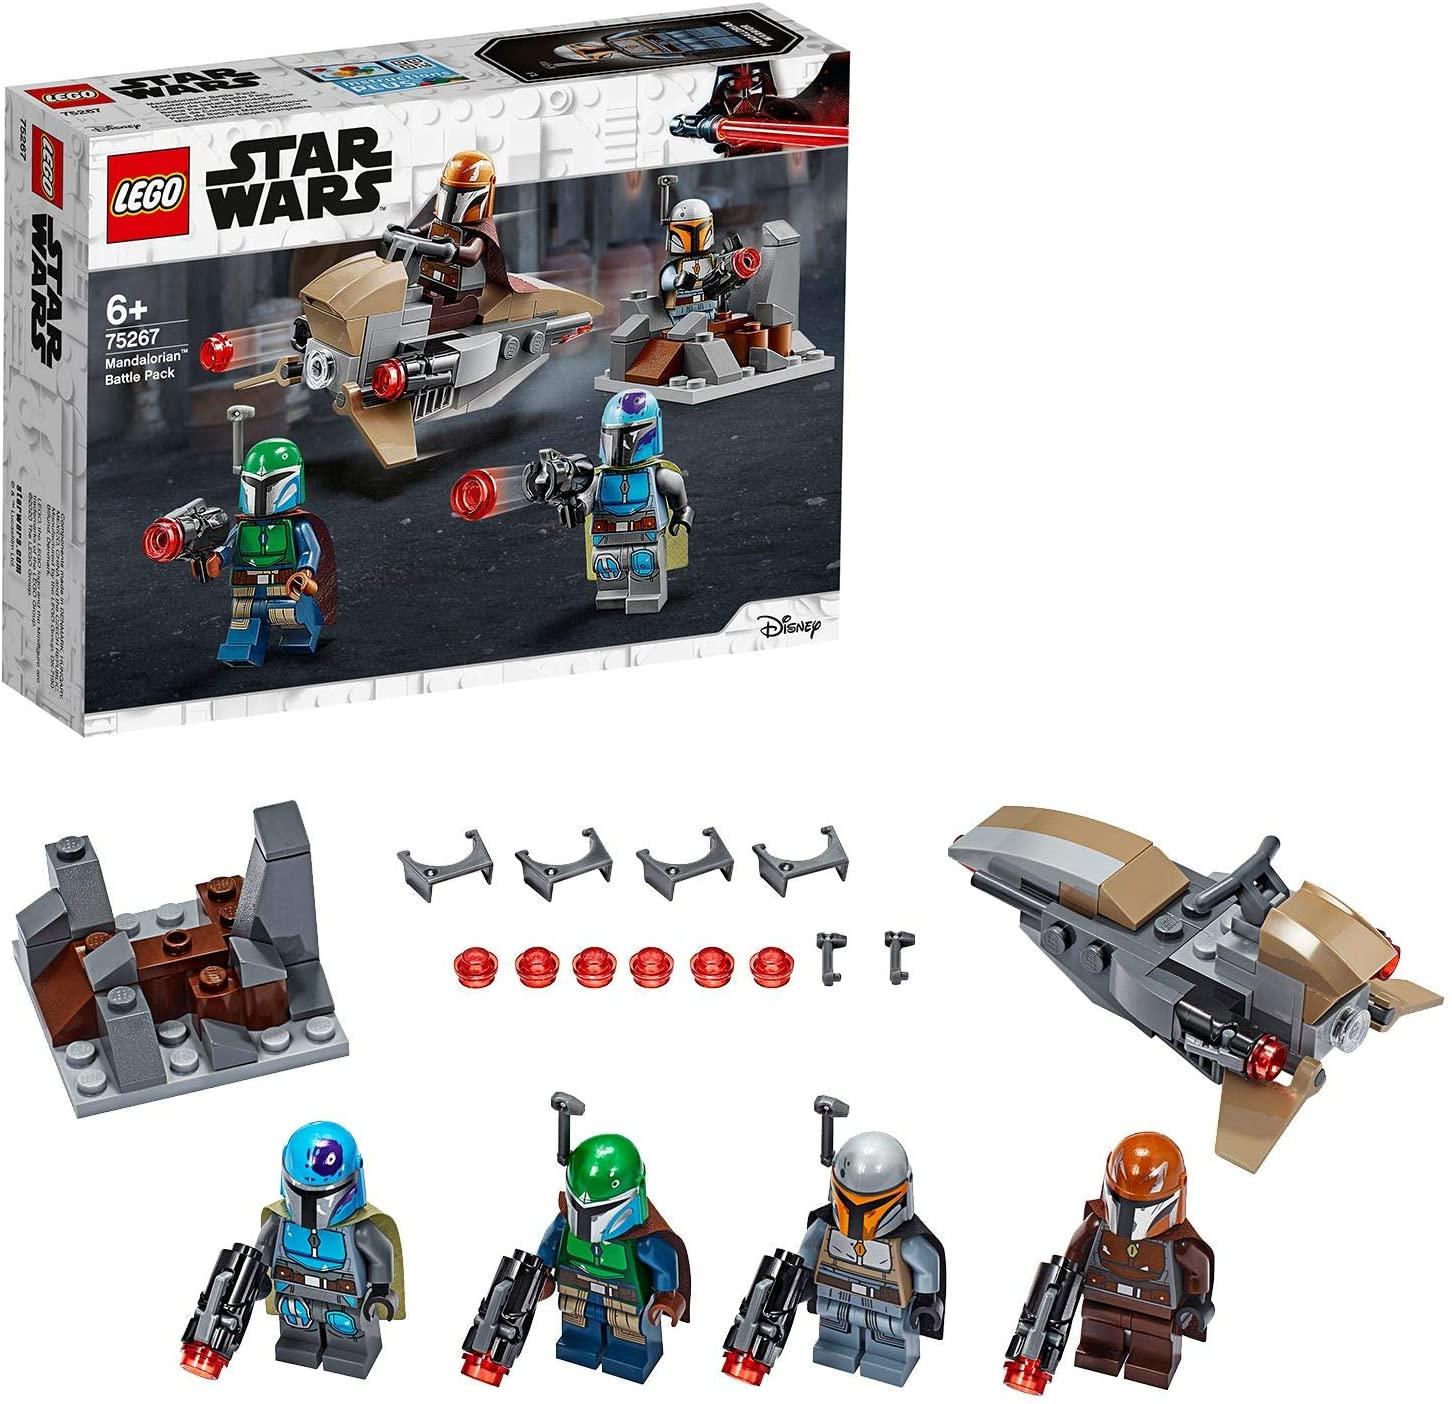 LEGO 75267 Star Wars Mandalorian Battle Pack Set with 4 Minifigures, Speeder Bike and Mini-fort £9.97 (+£4.49 Non Prime) @ Amazon